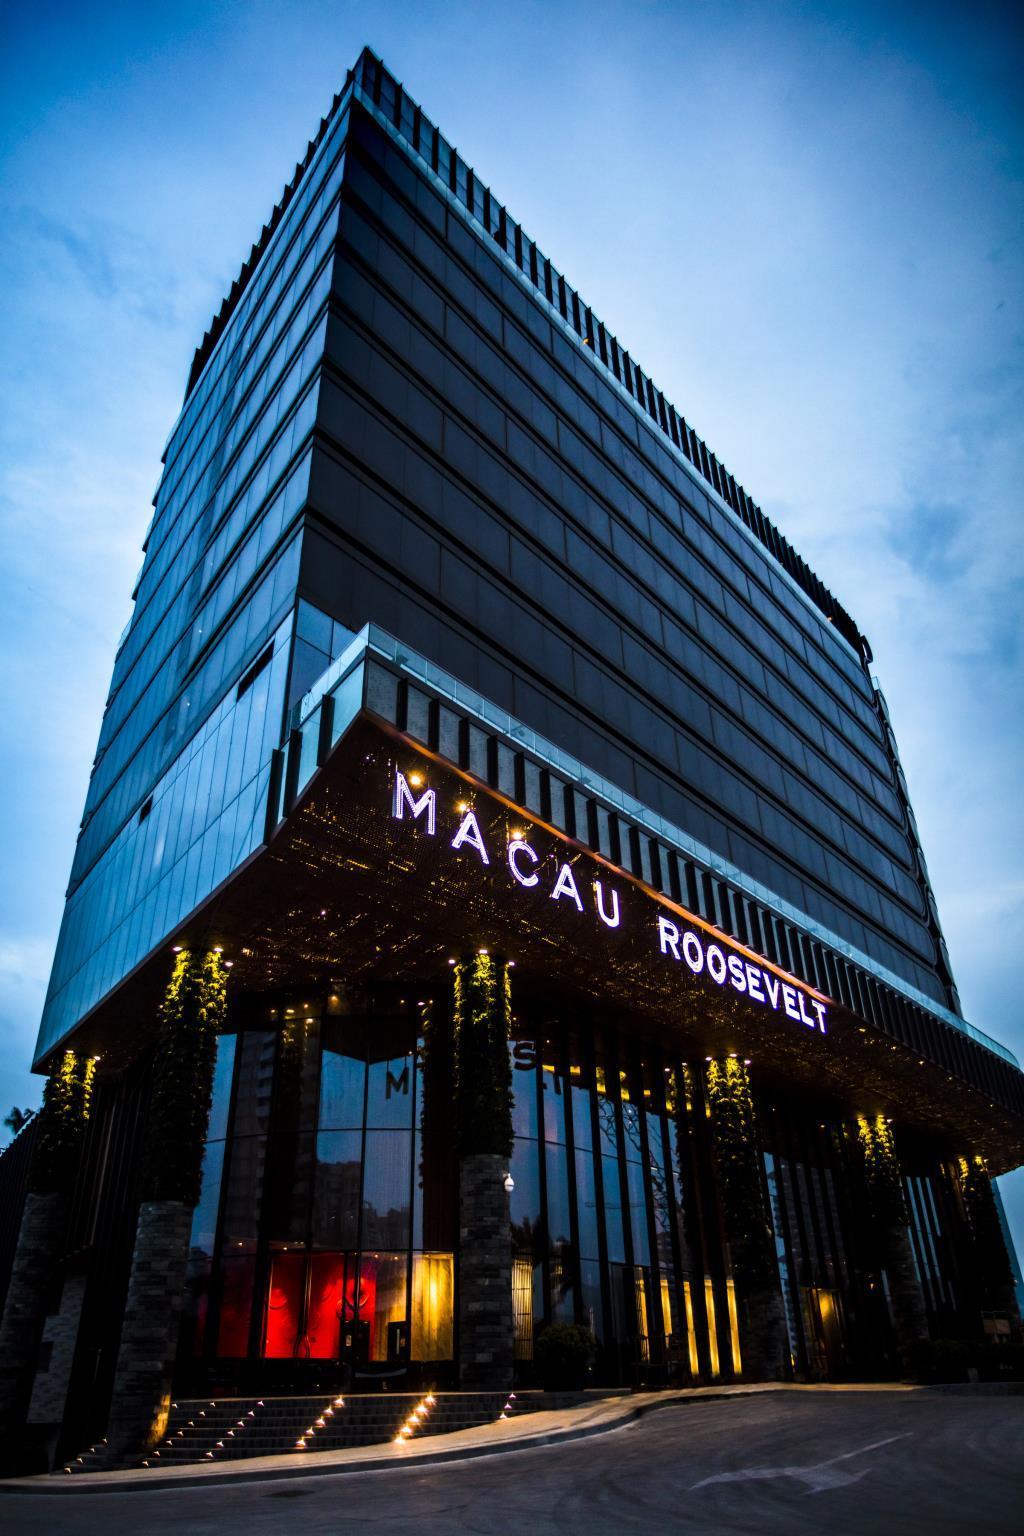 The Macau Roosevelt